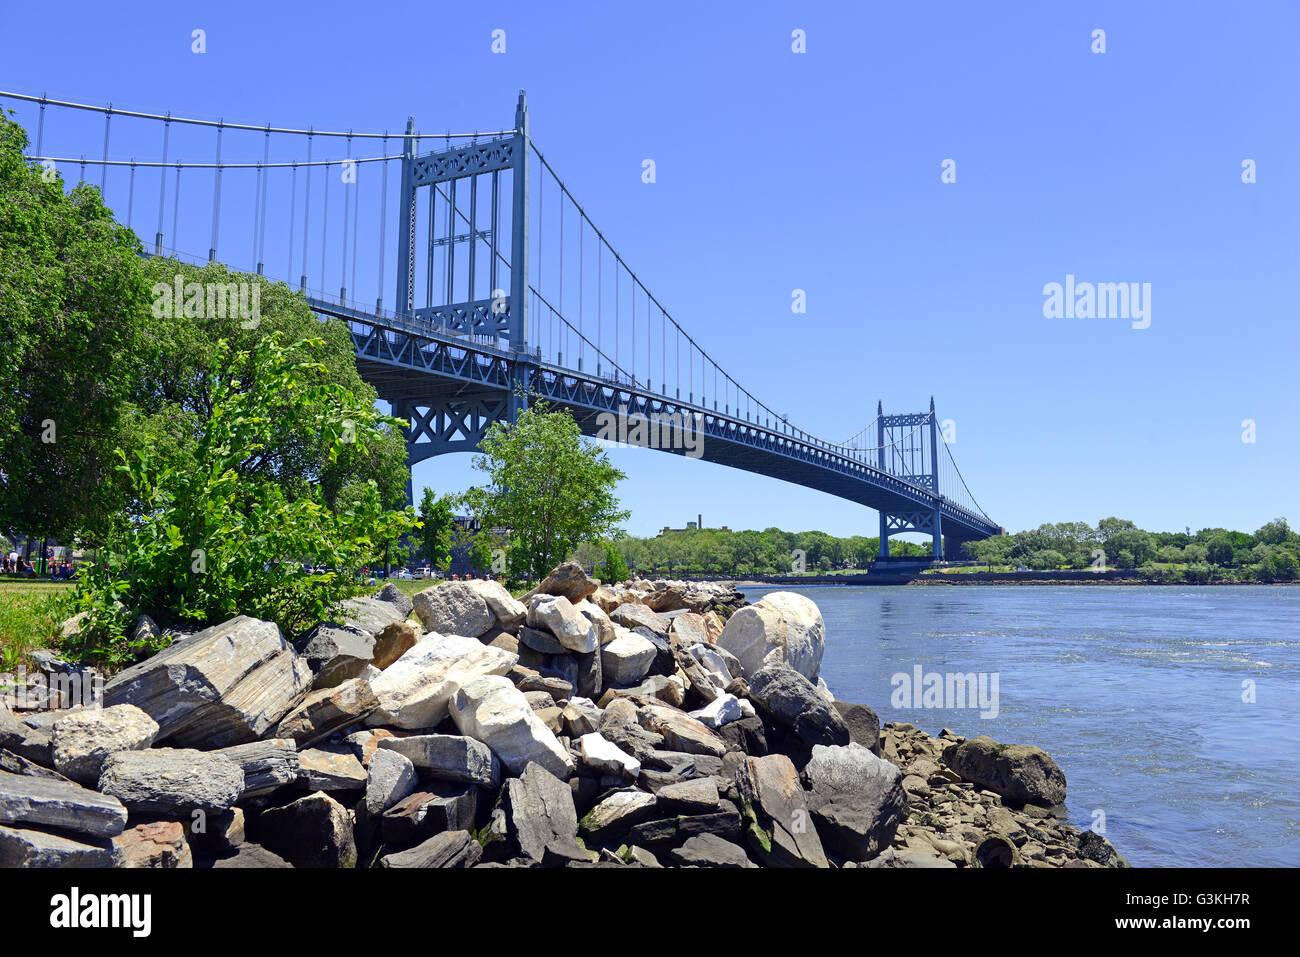 The Triborough Bridge spanning over Randall's Island, New York City - Stock Image